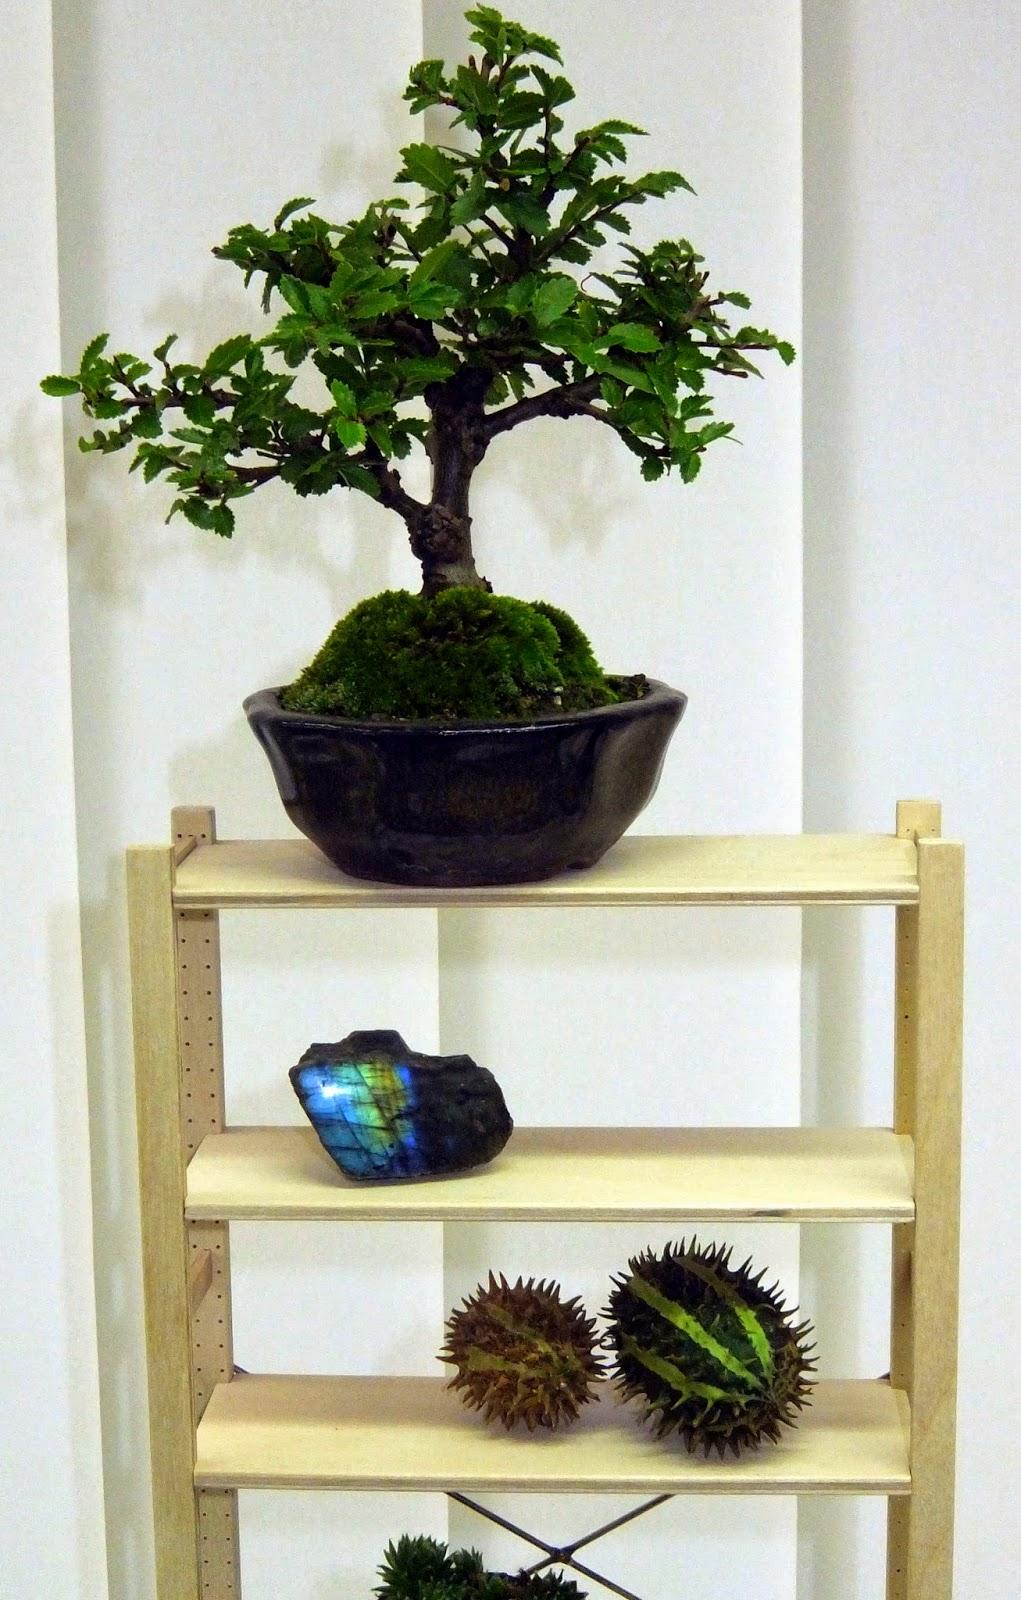 bonsai gemeinschaft mein neues bonsai regal. Black Bedroom Furniture Sets. Home Design Ideas